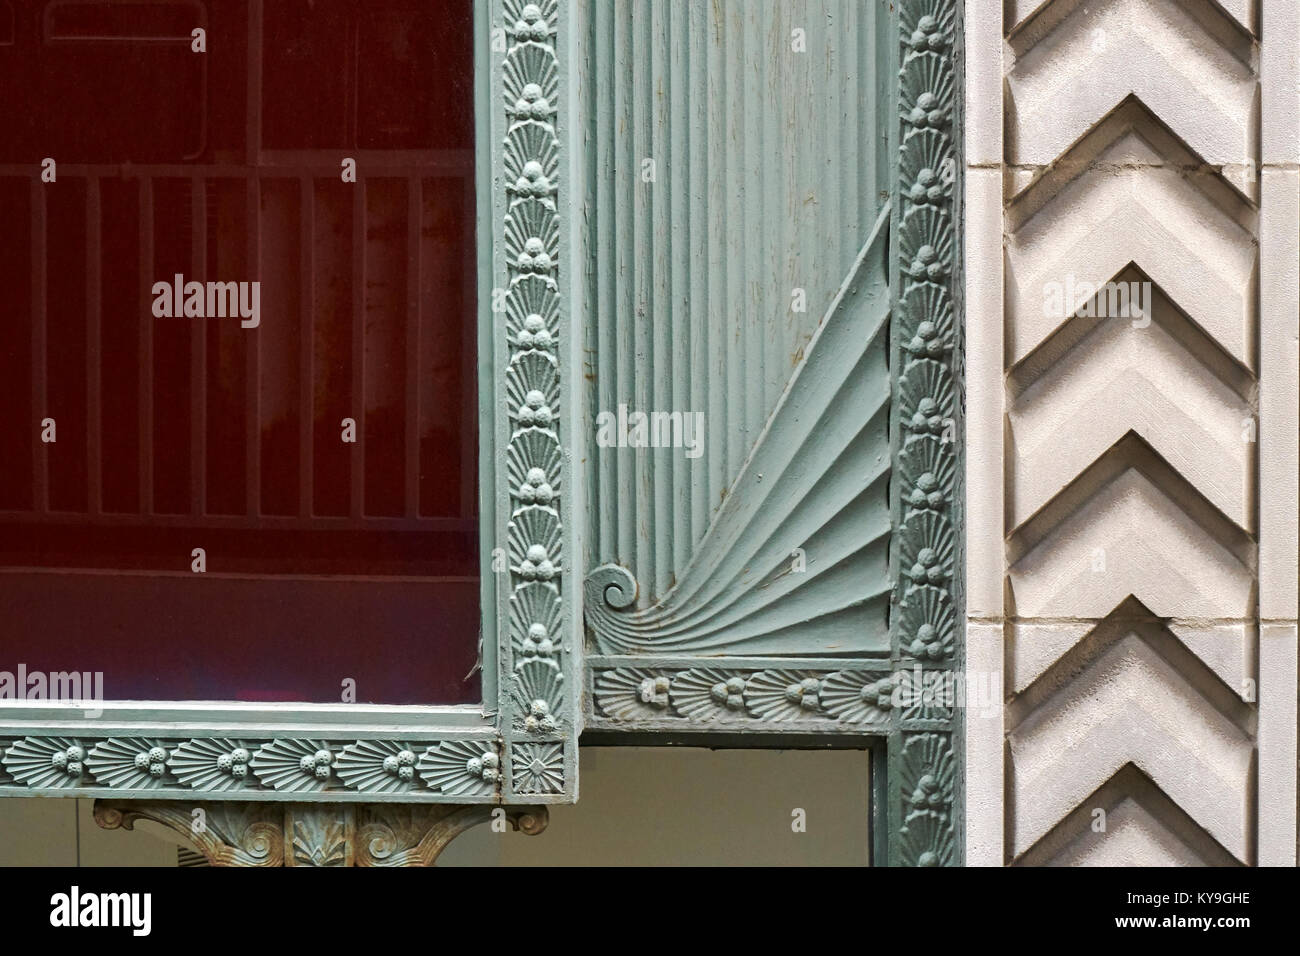 Glass Frames Stockfotos & Glass Frames Bilder - Alamy